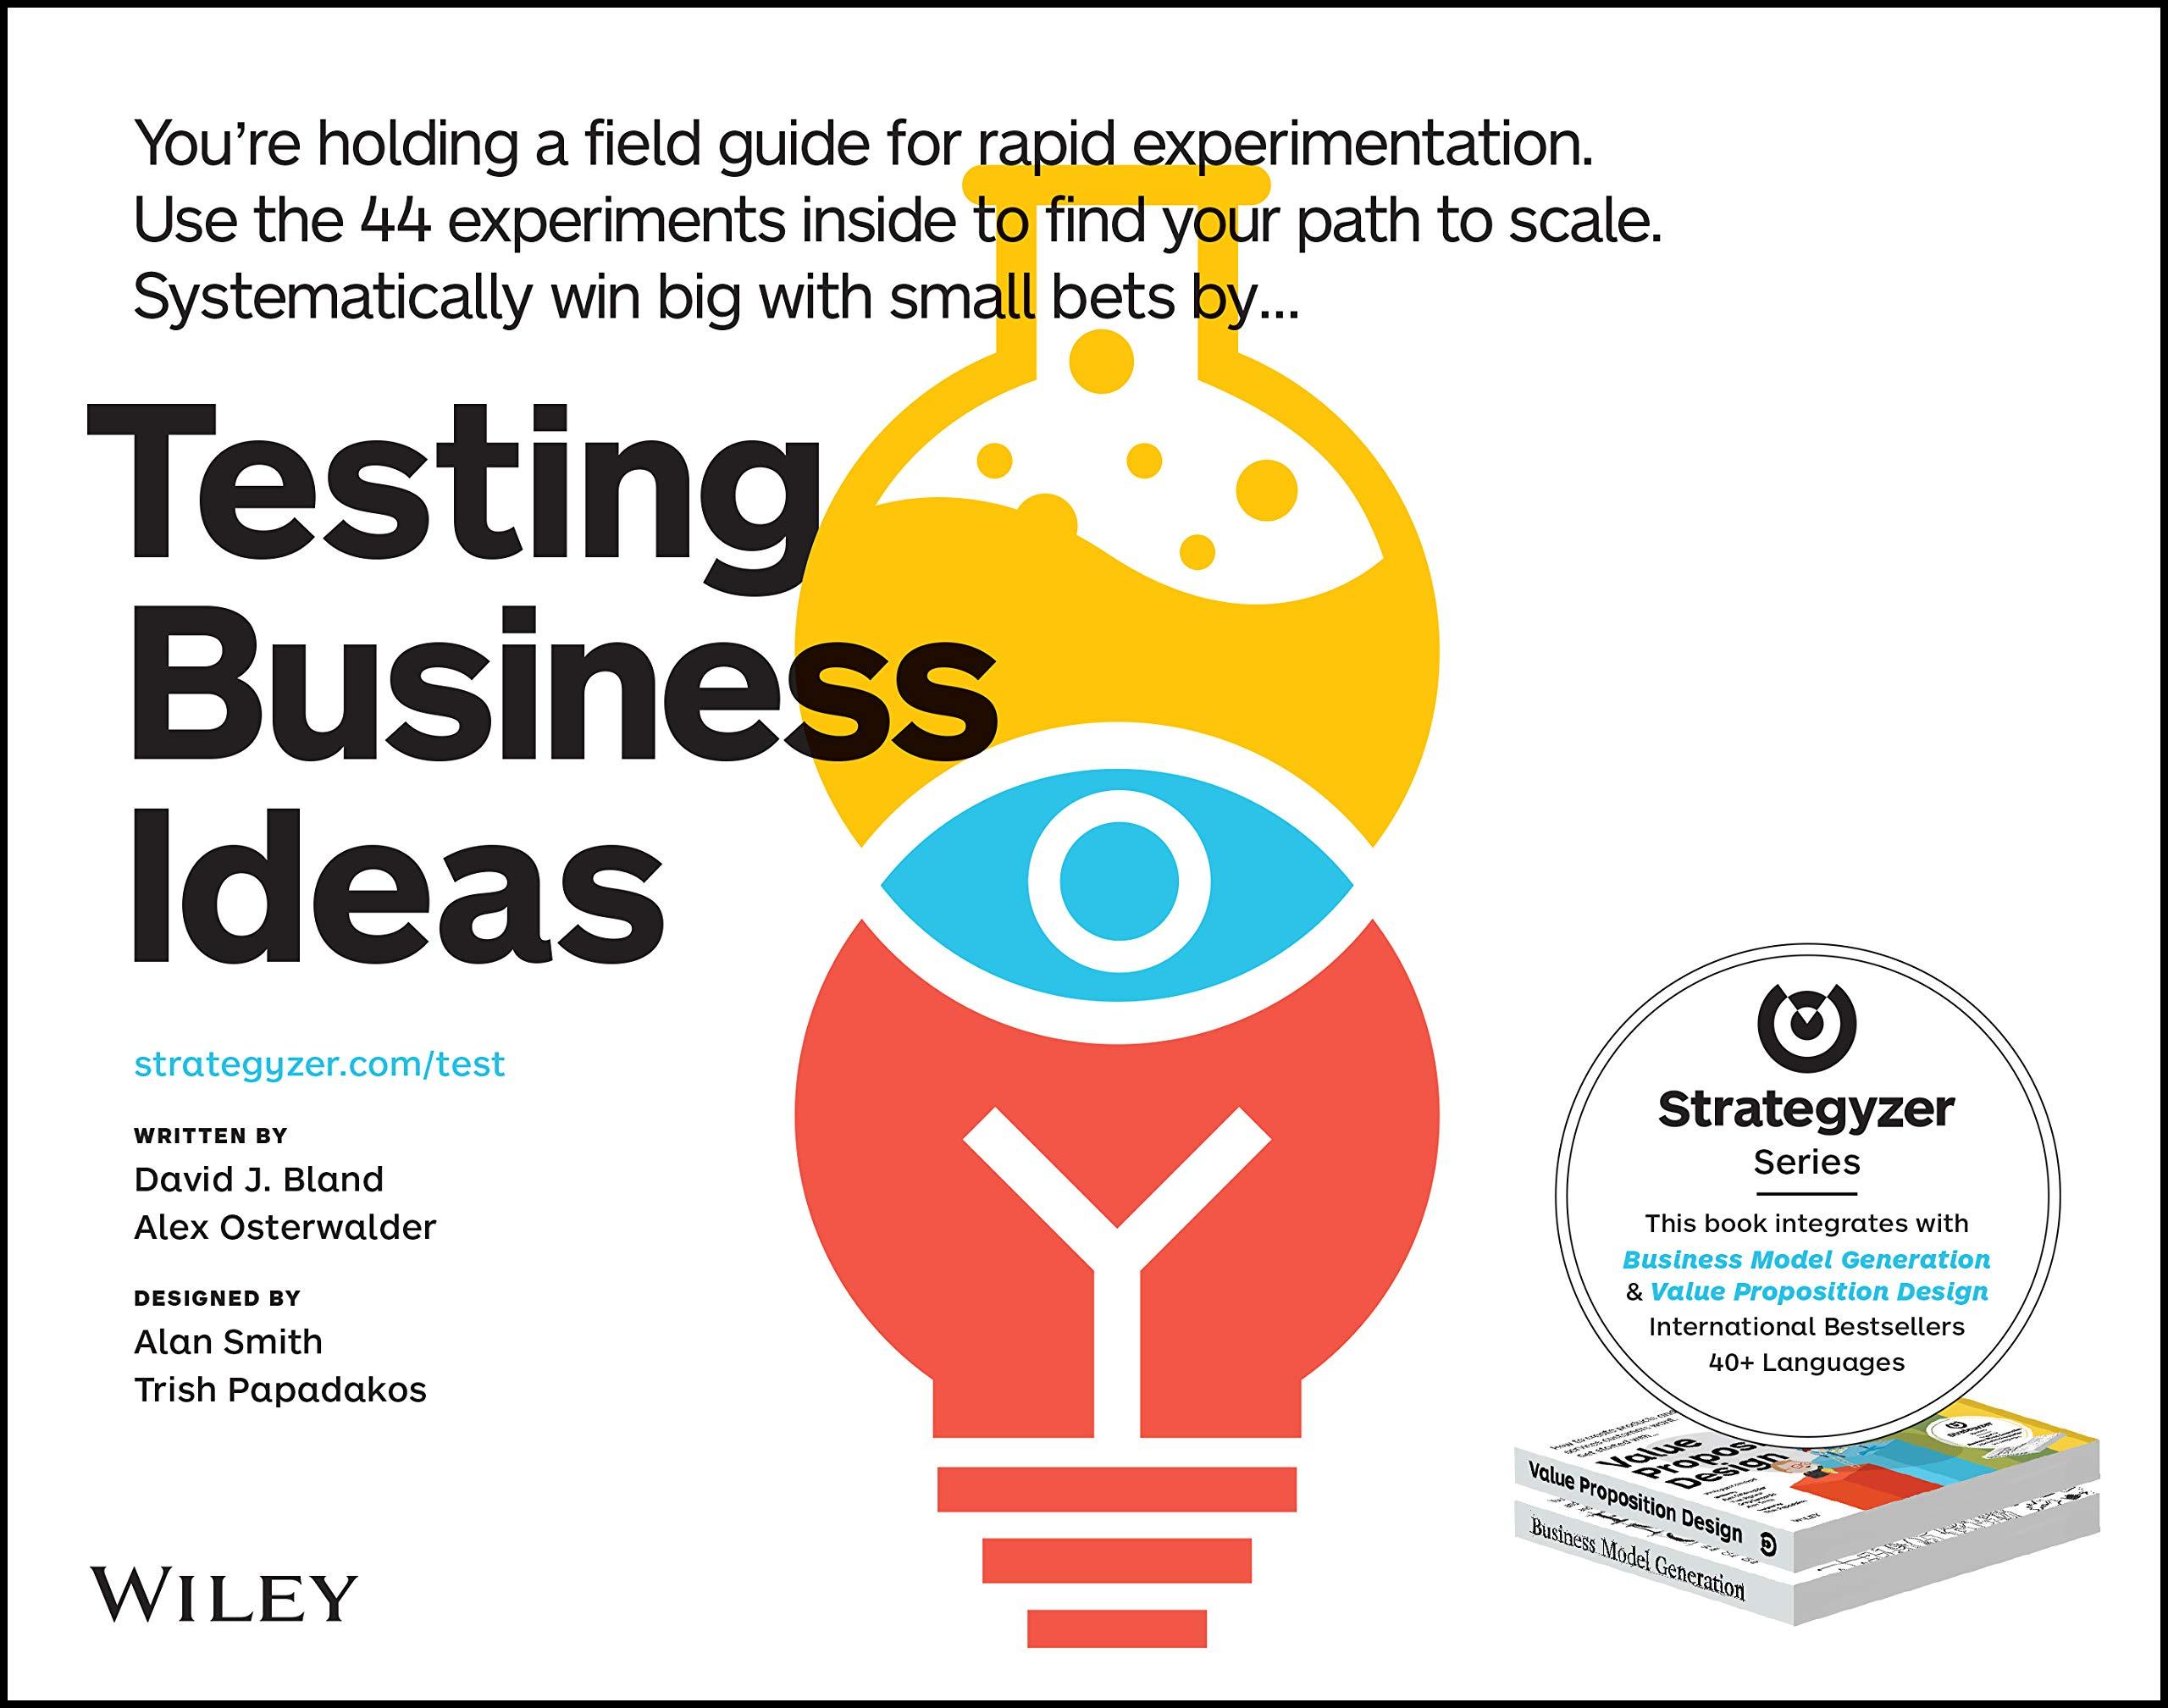 Testing Business Ideas A Field Guide For Rapid Experimentation Bland David J Osterwalder Alexander Amazon De Bücher